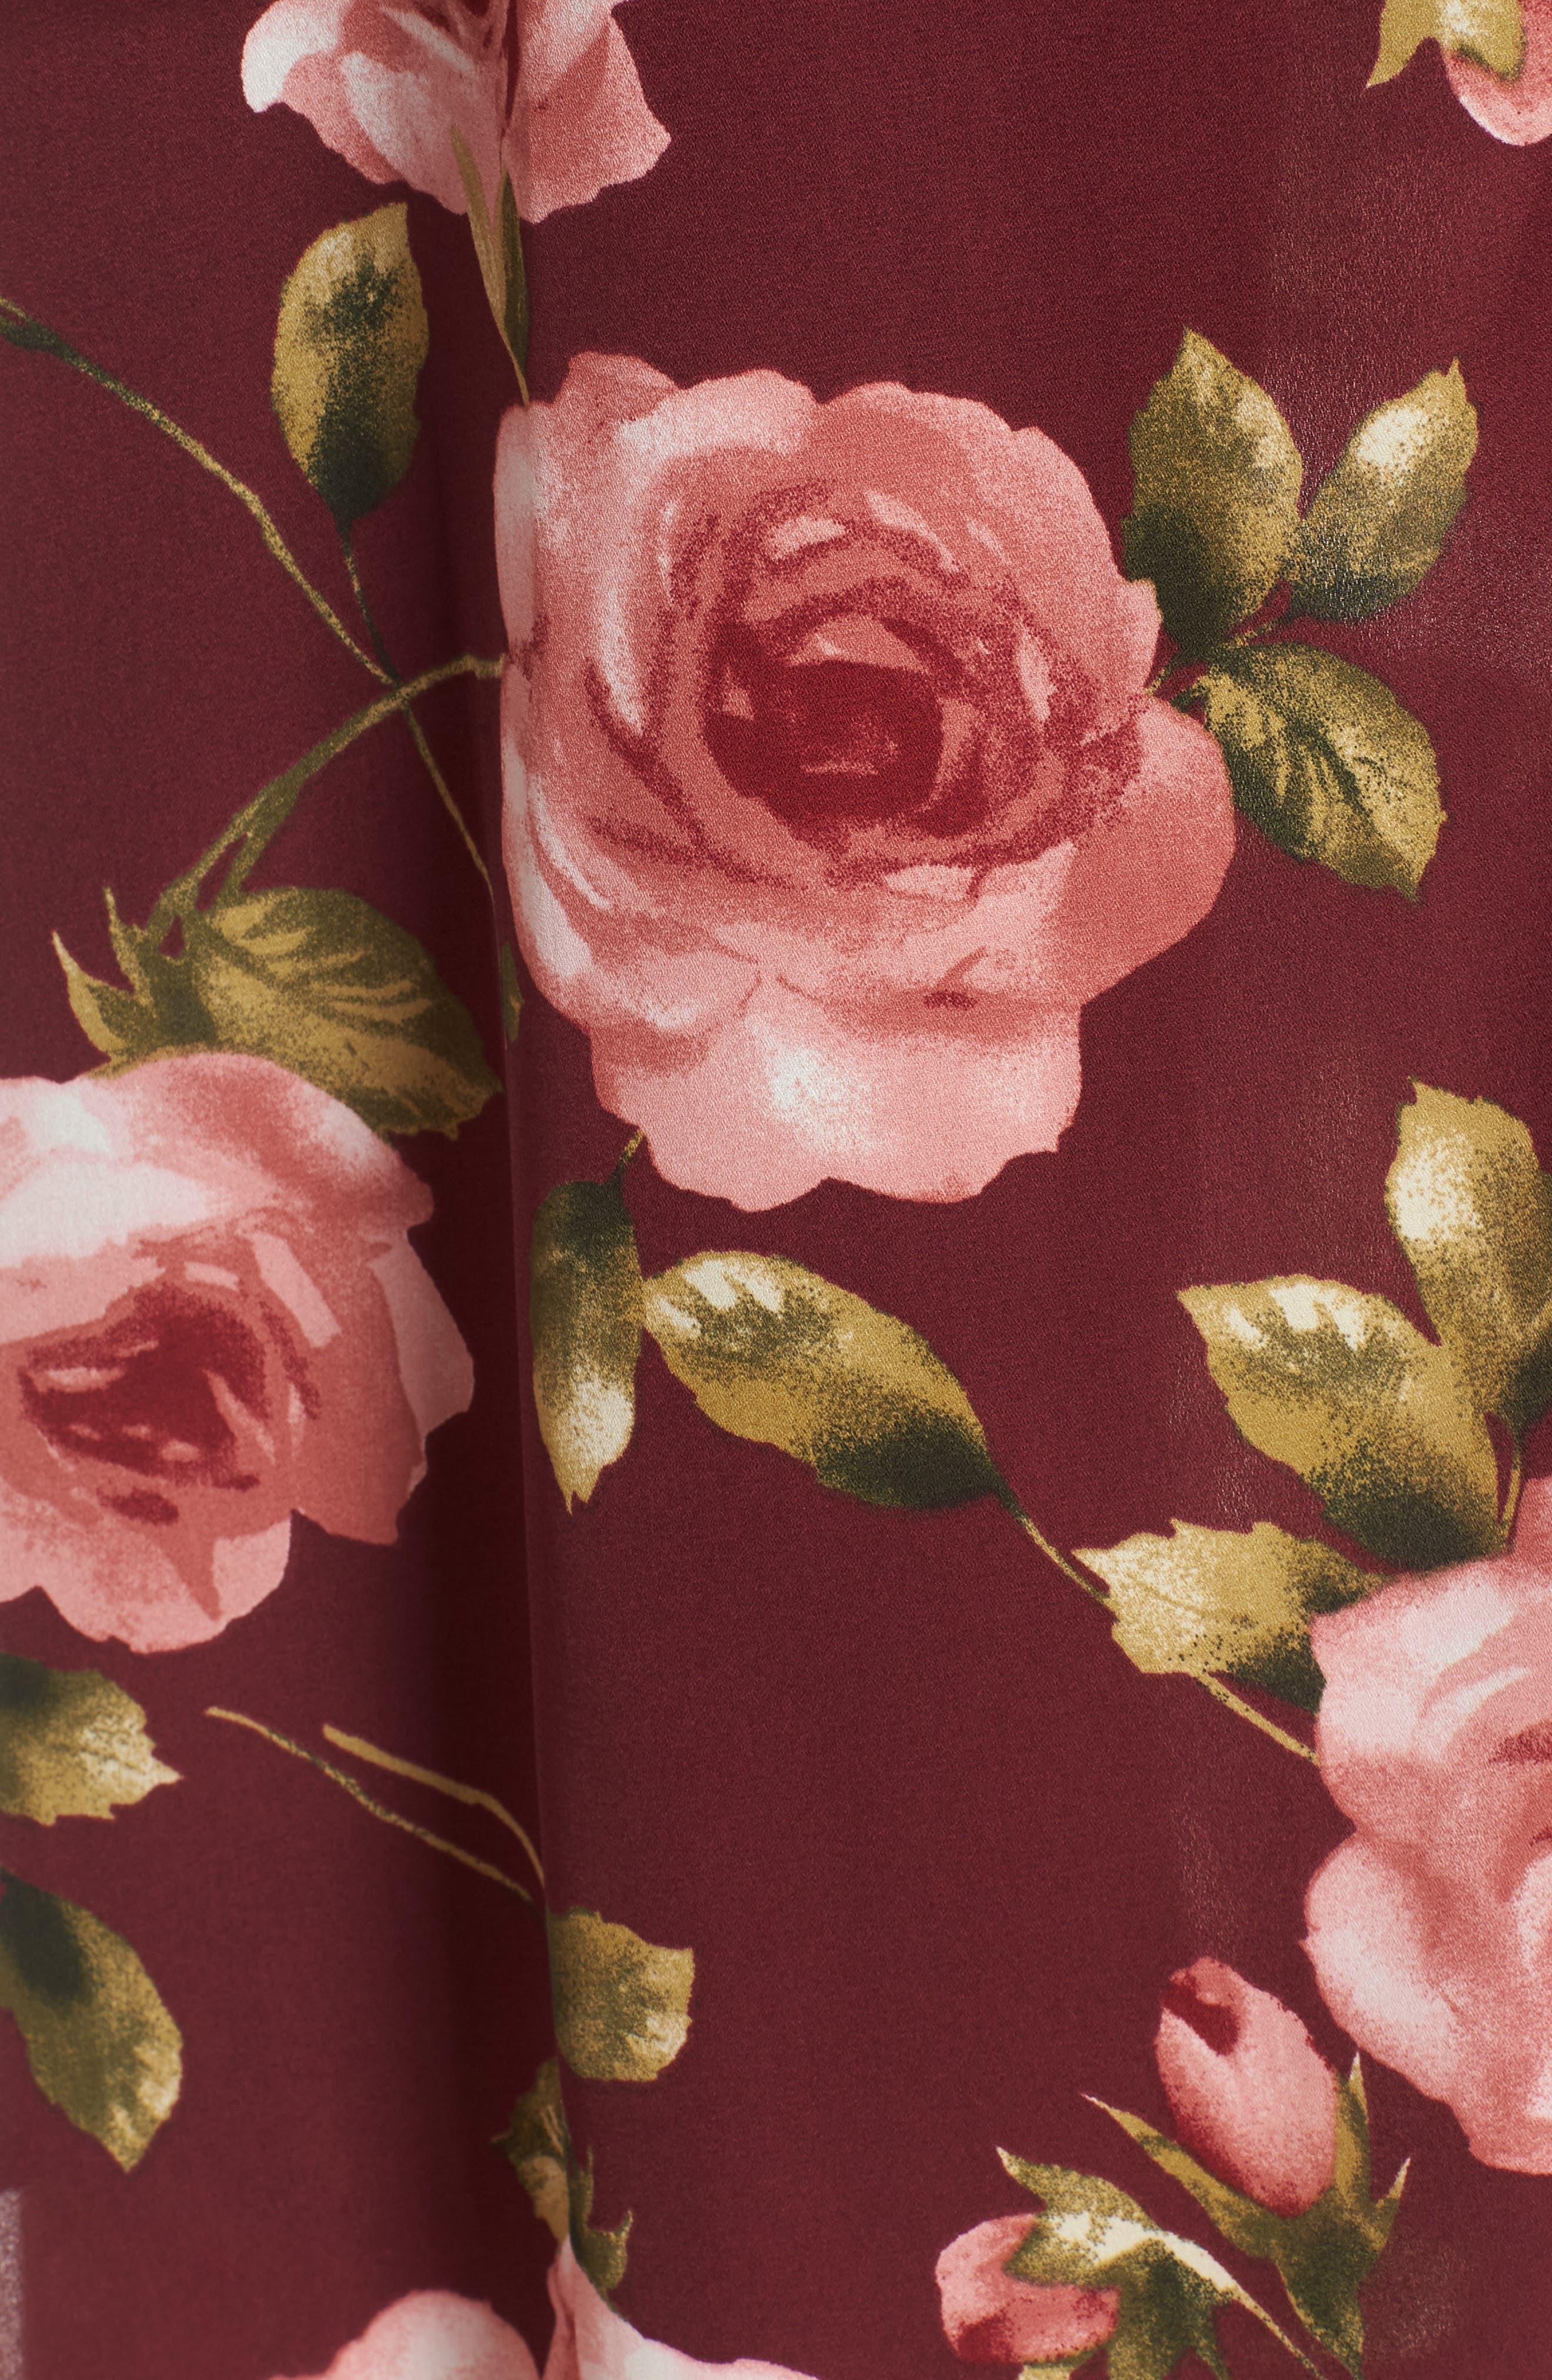 Floral Midi Romper,                             Alternate thumbnail 6, color,                             Burgundy Floral